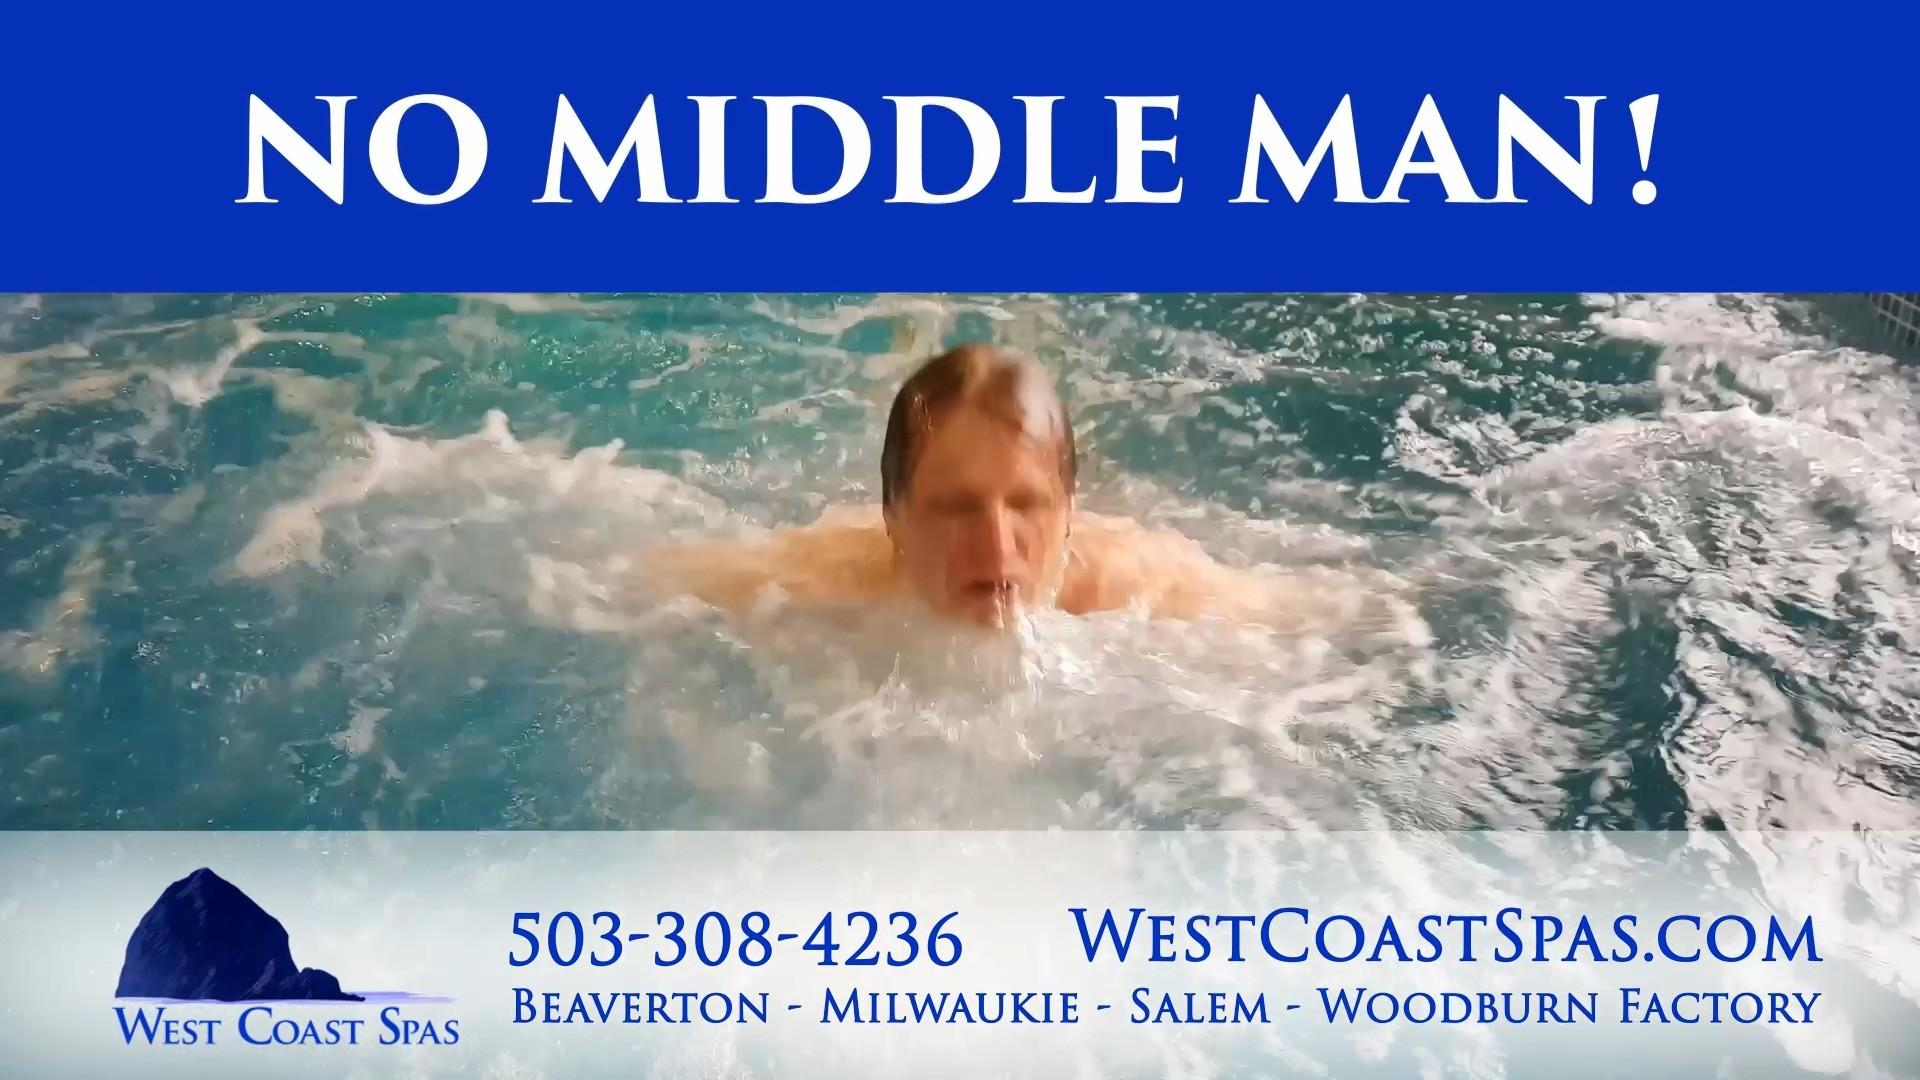 West Coast Spas: Swim Spas